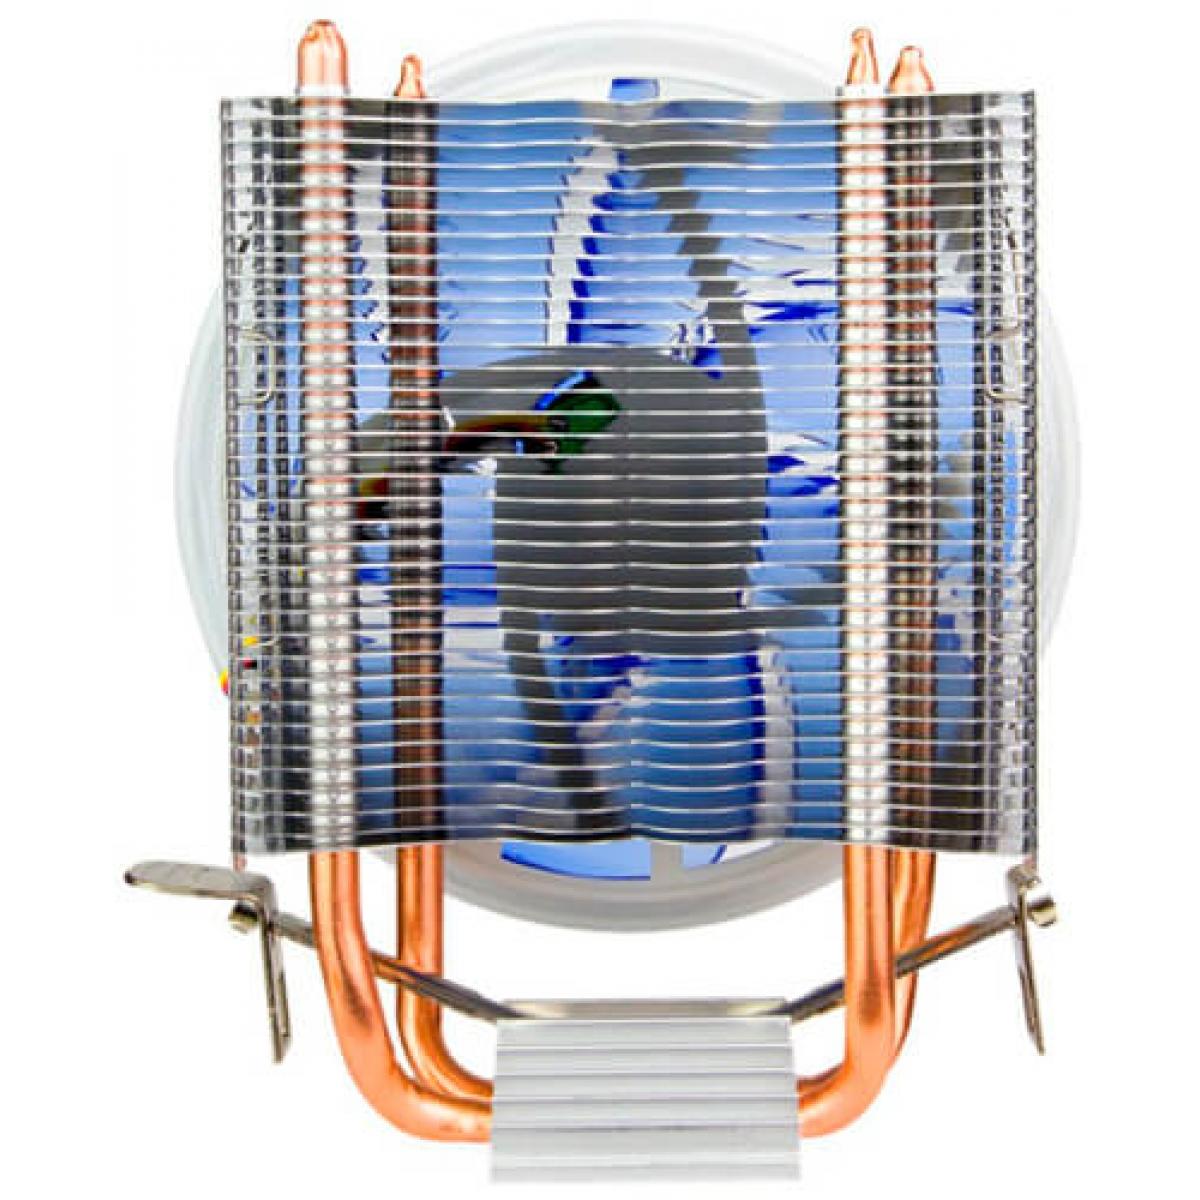 Cooler para Processador Alseye Aurora 120T, LED Azul 140mm, Intel-AMD, ASAR120T